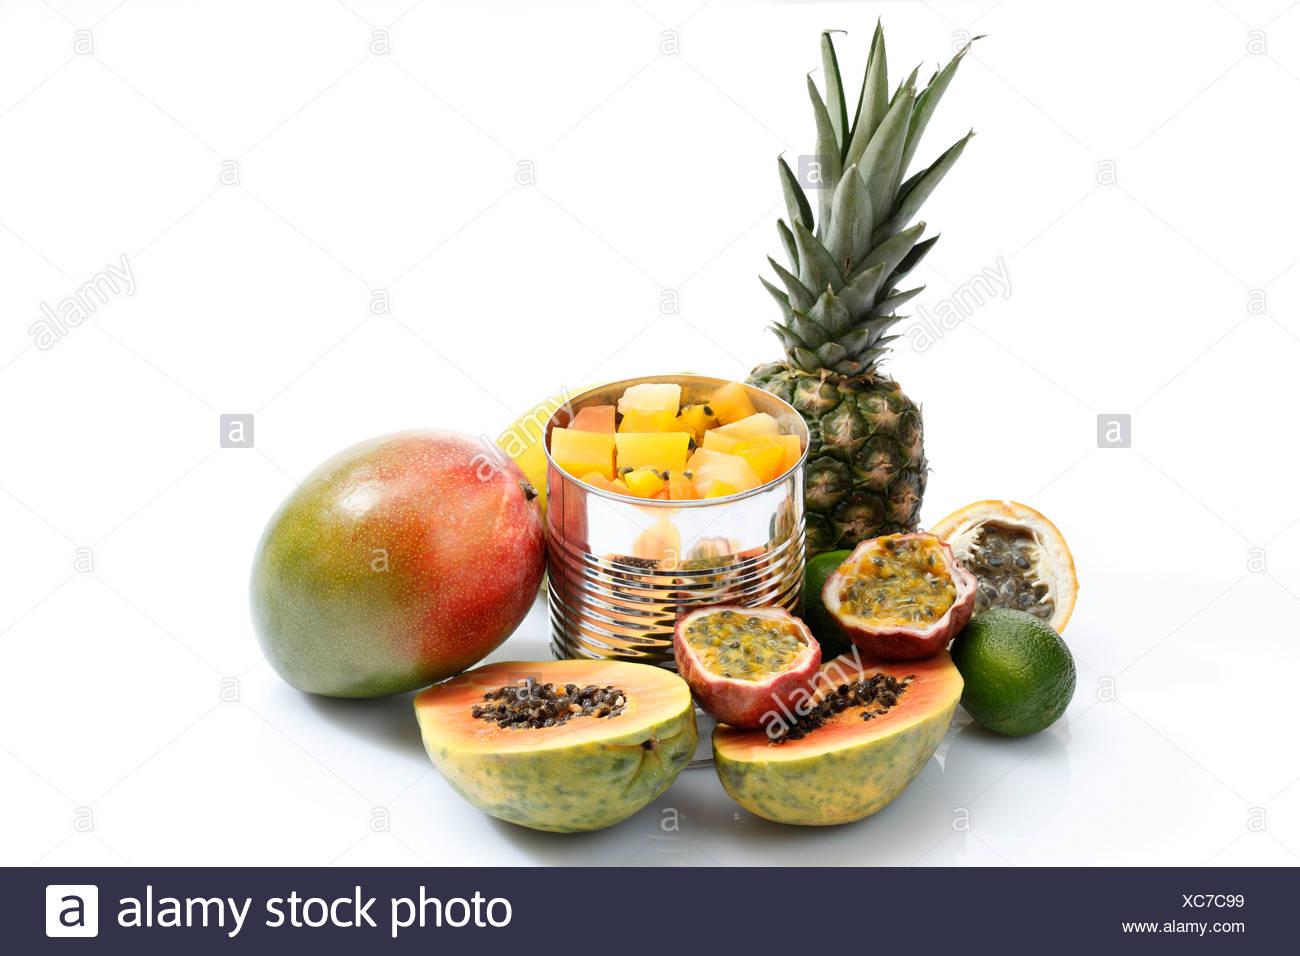 Variety of fruits on white background - Stock Image